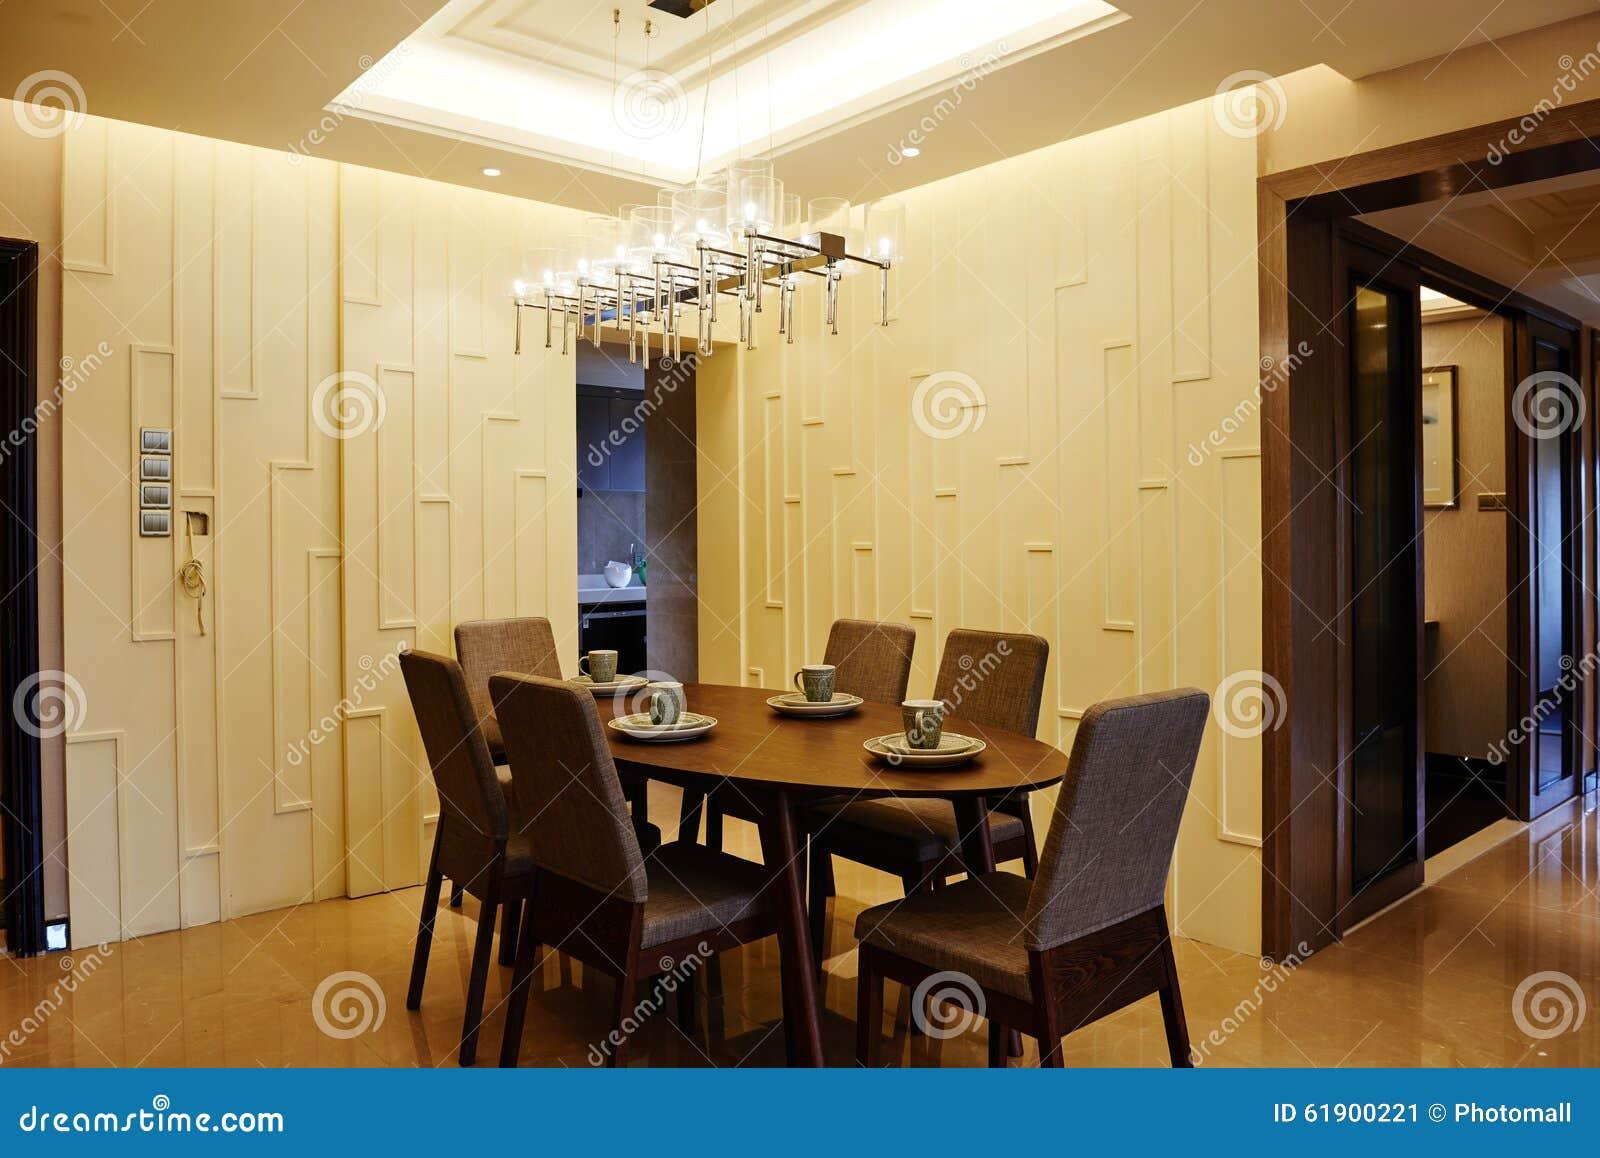 Assi Di Legno In Inglese : Sala da pranzo moderna immagine stock immagine di scrittorio